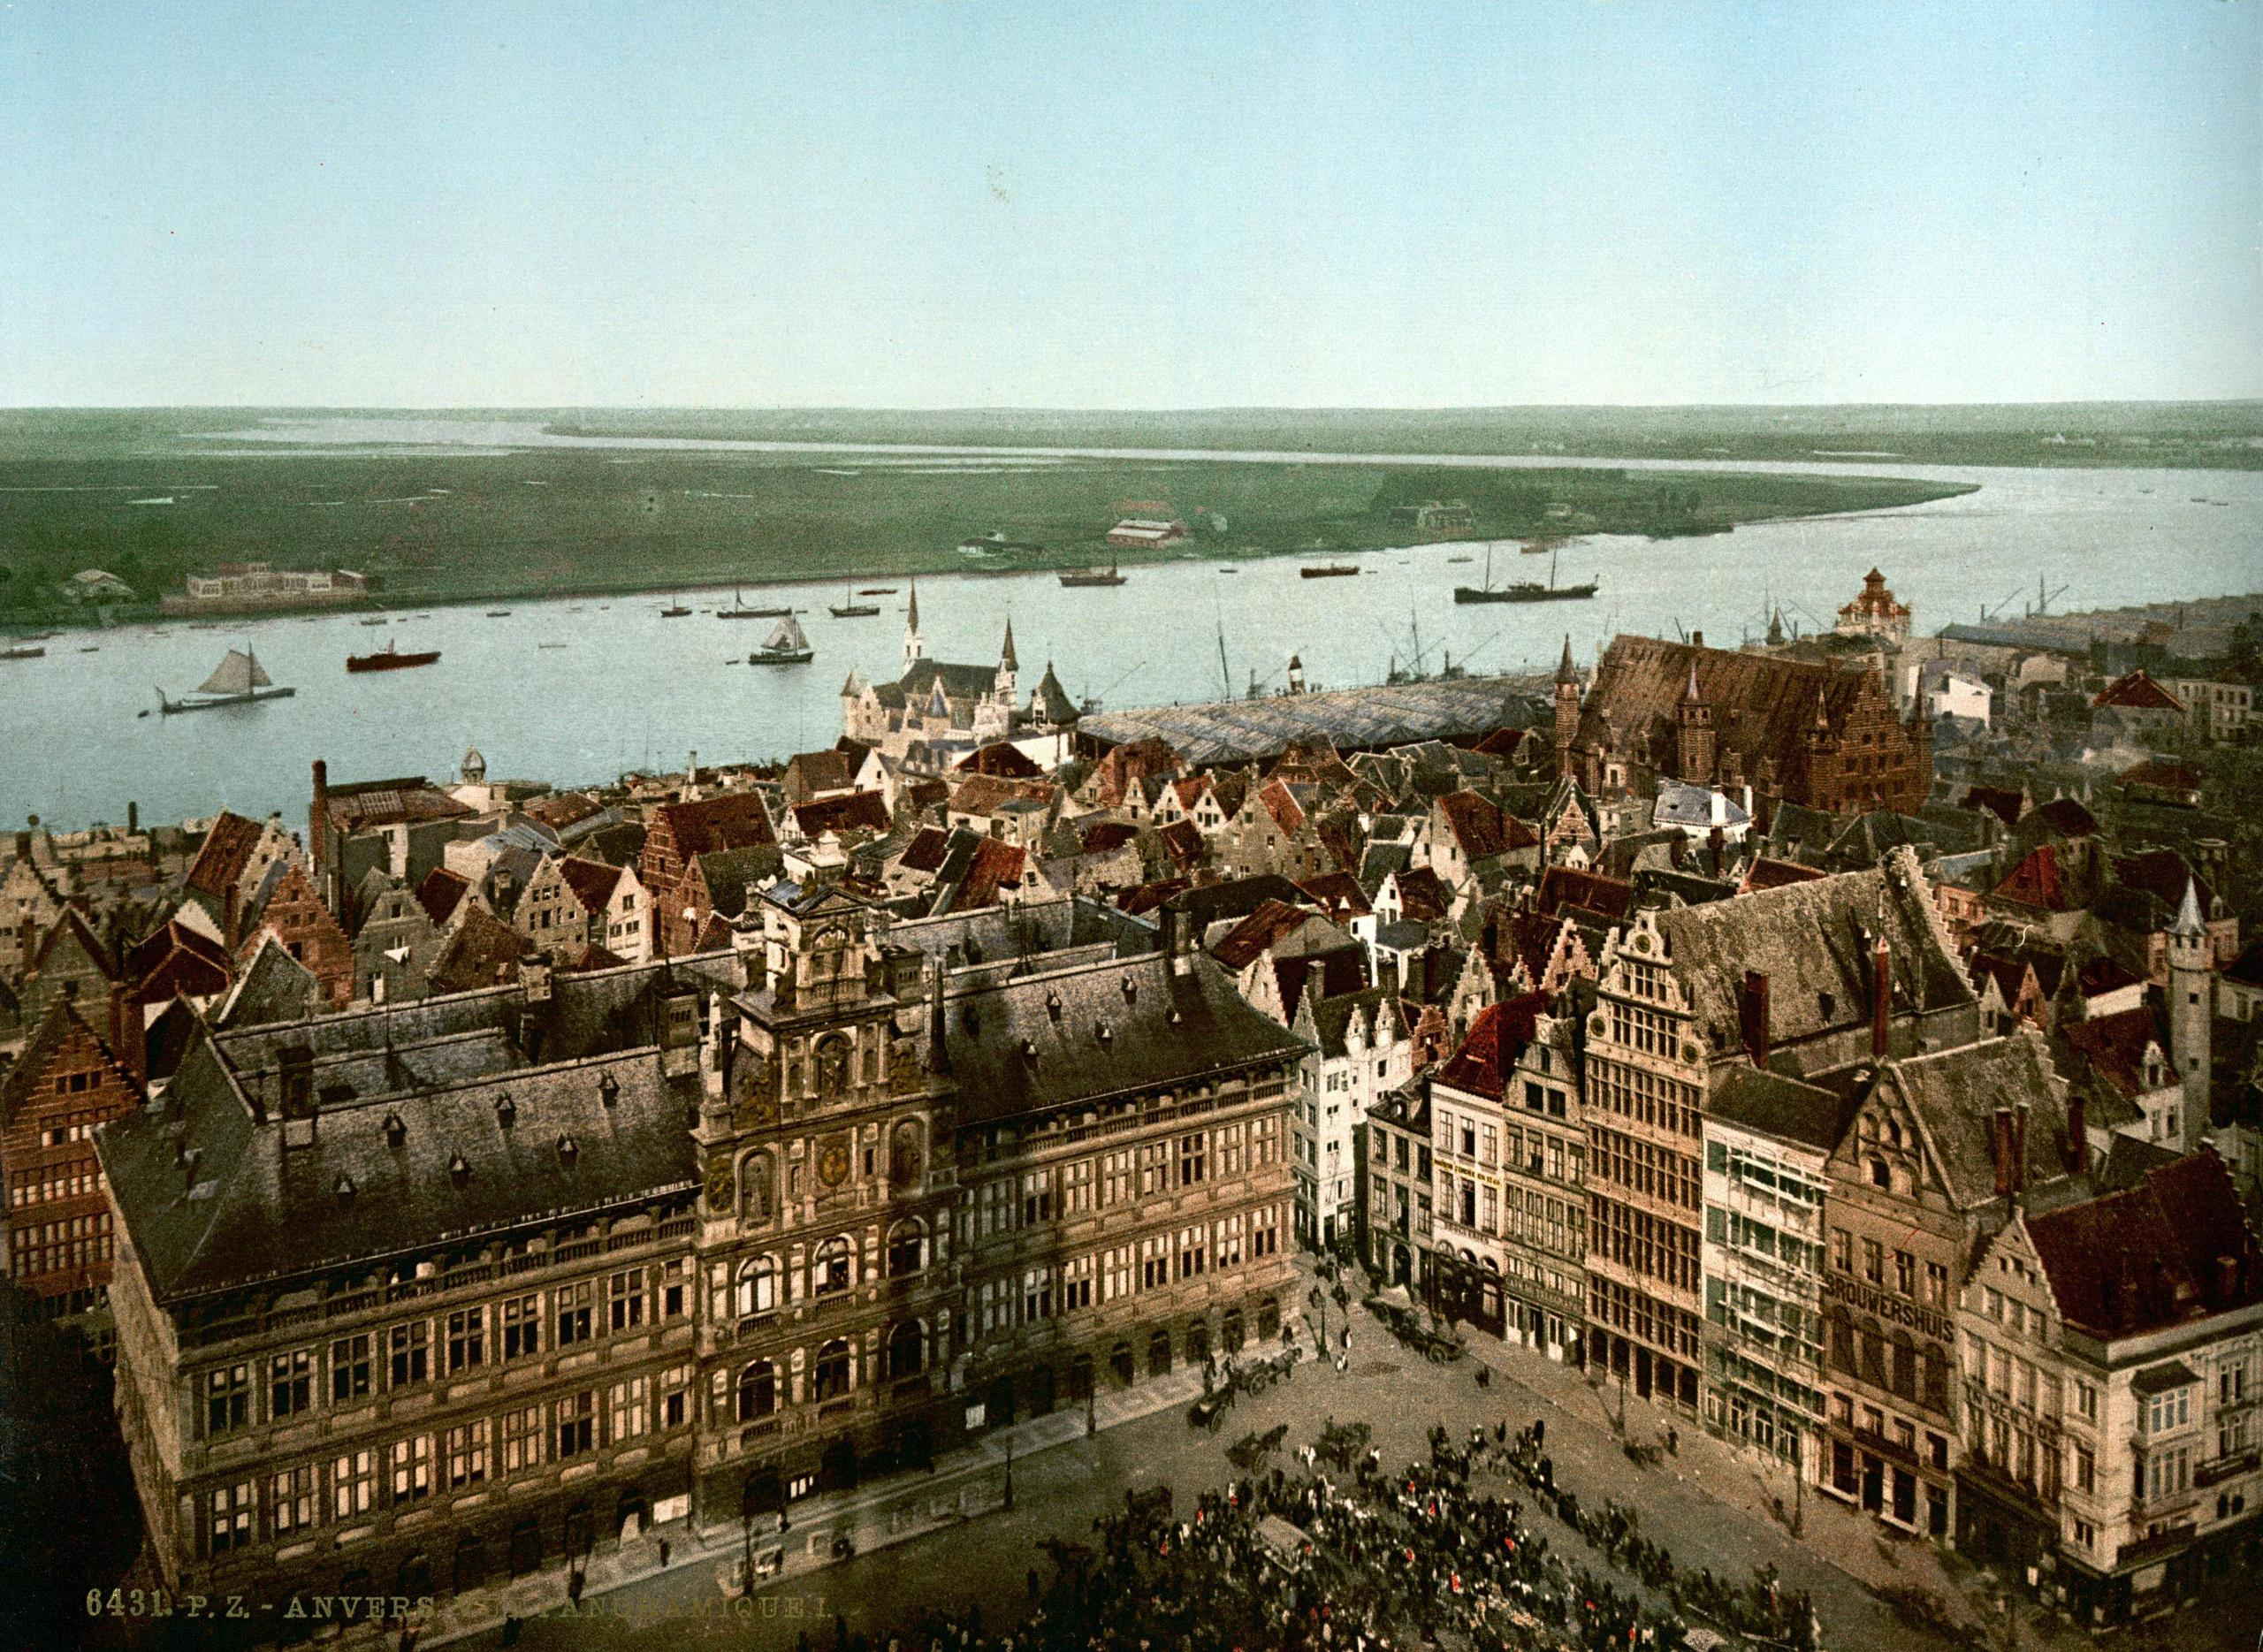 1900. Antwerpen látképe..jpg